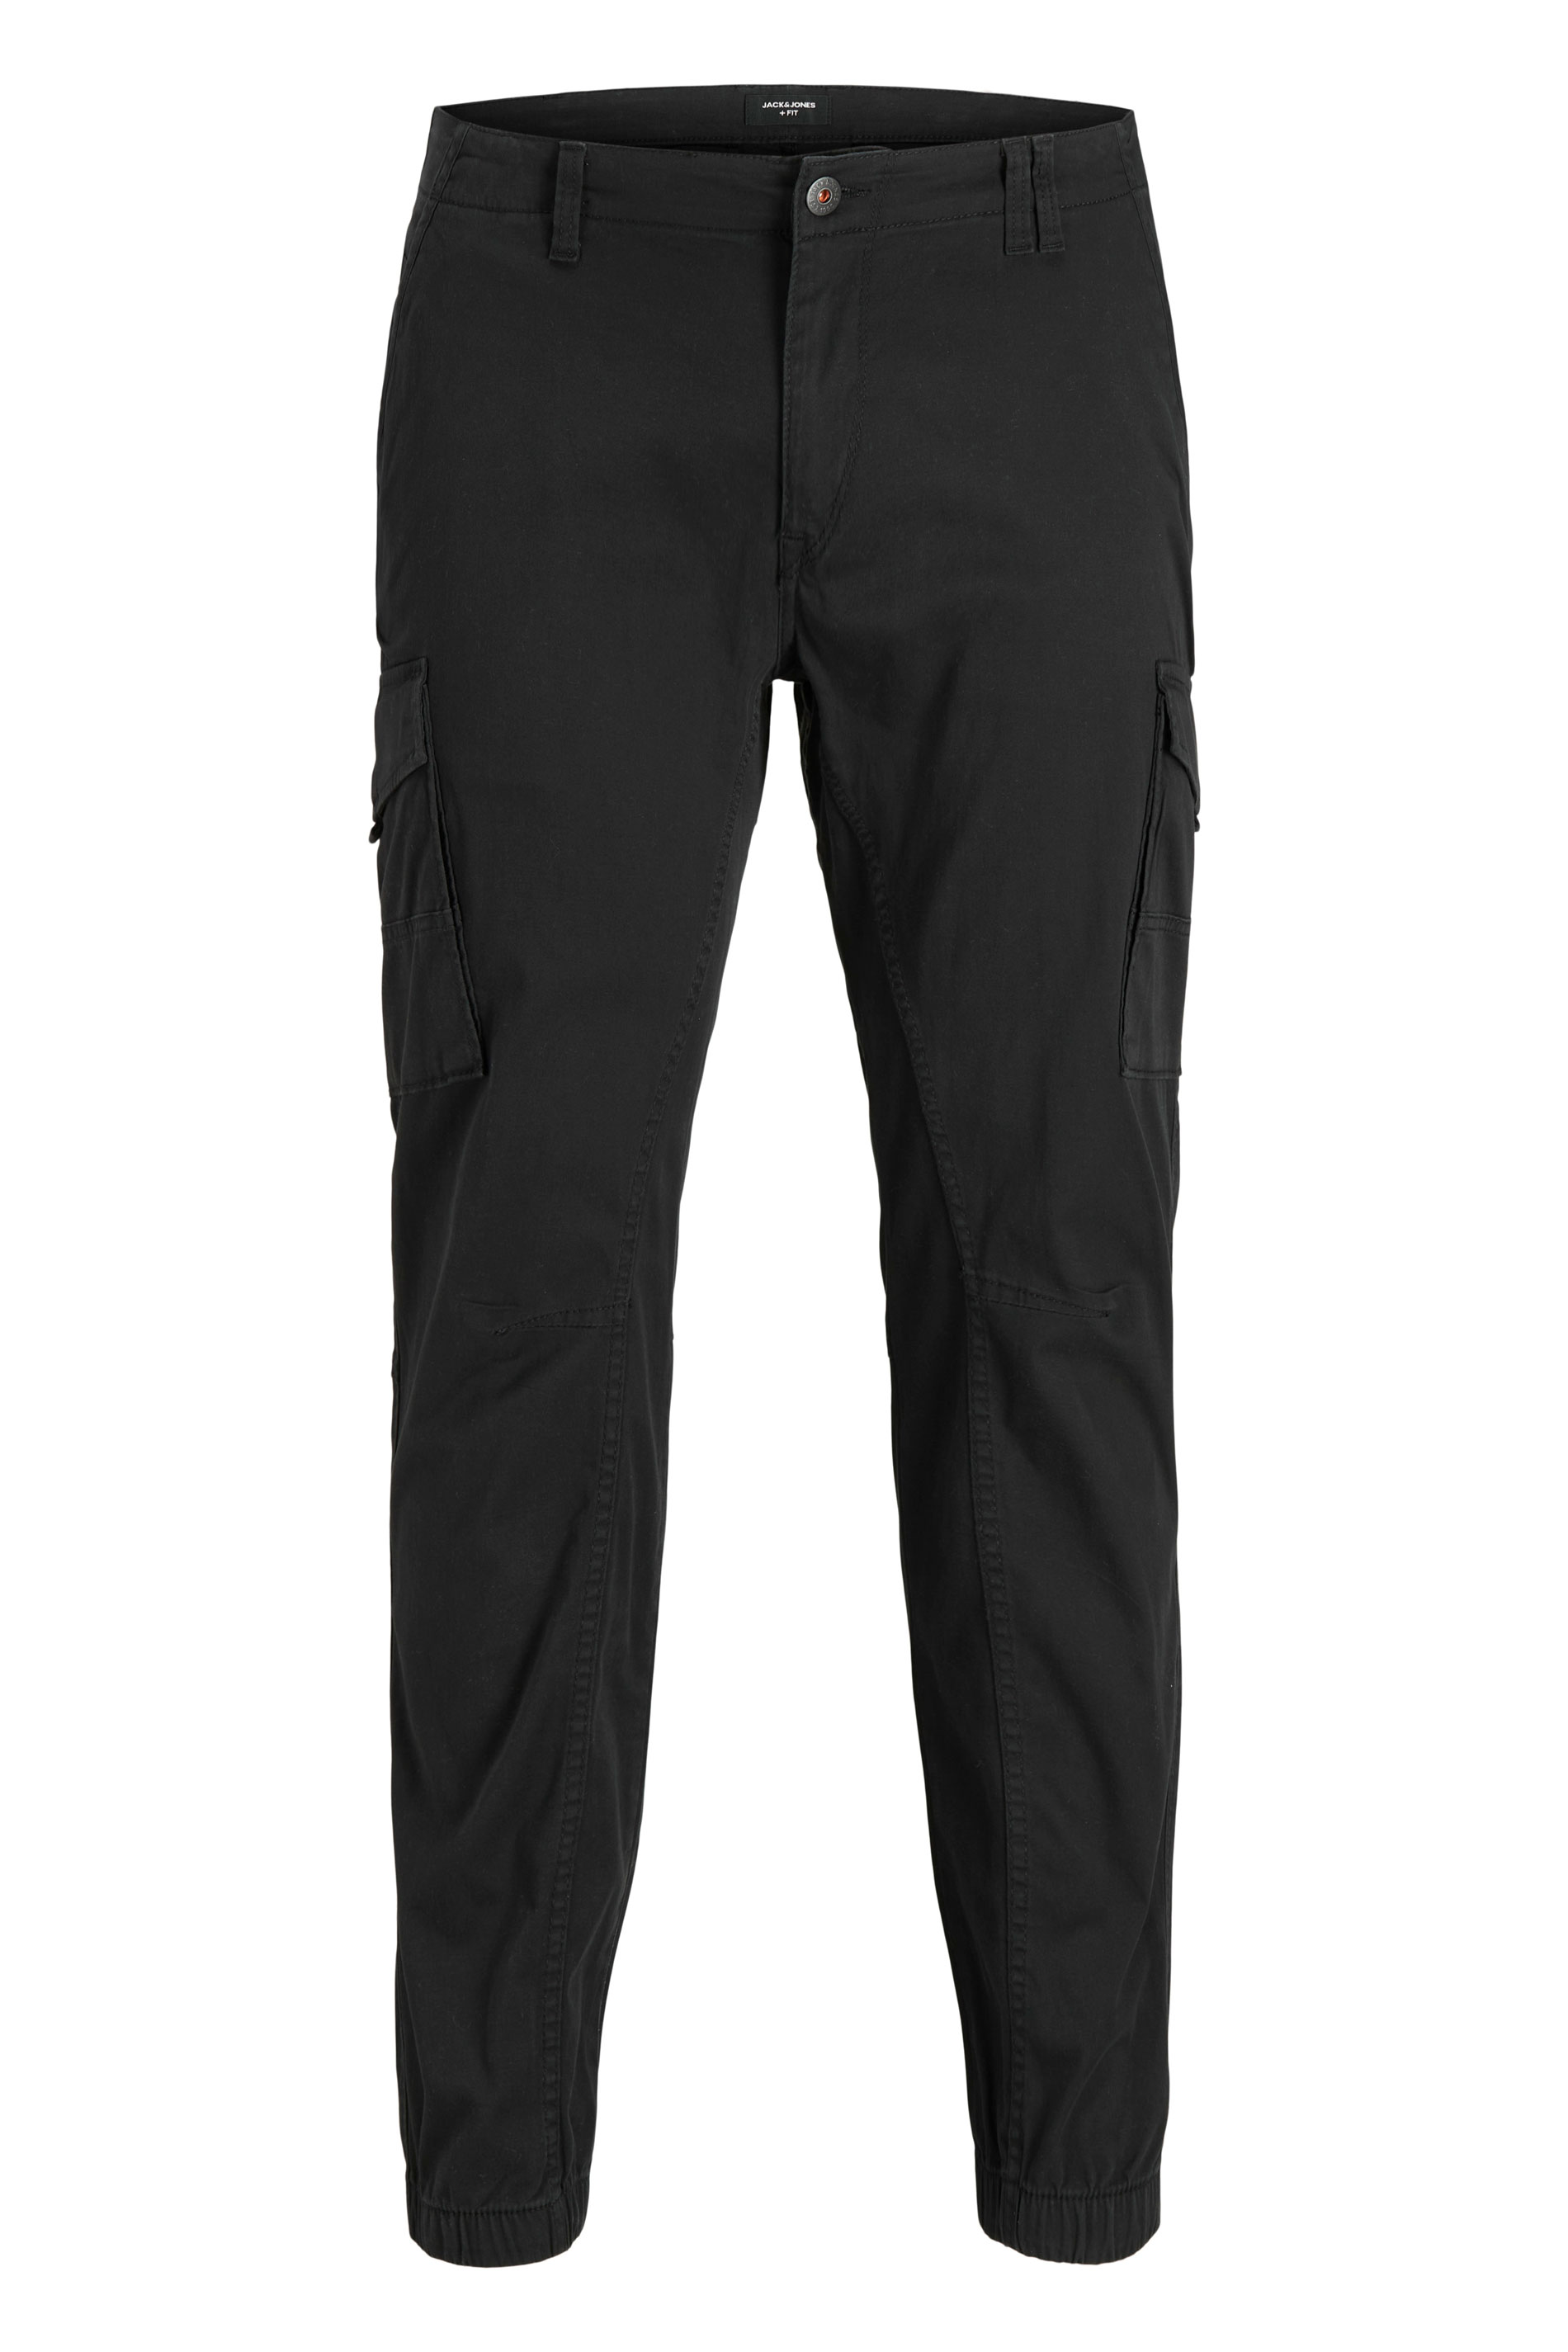 JACK & JONES Black Cargo Trousers